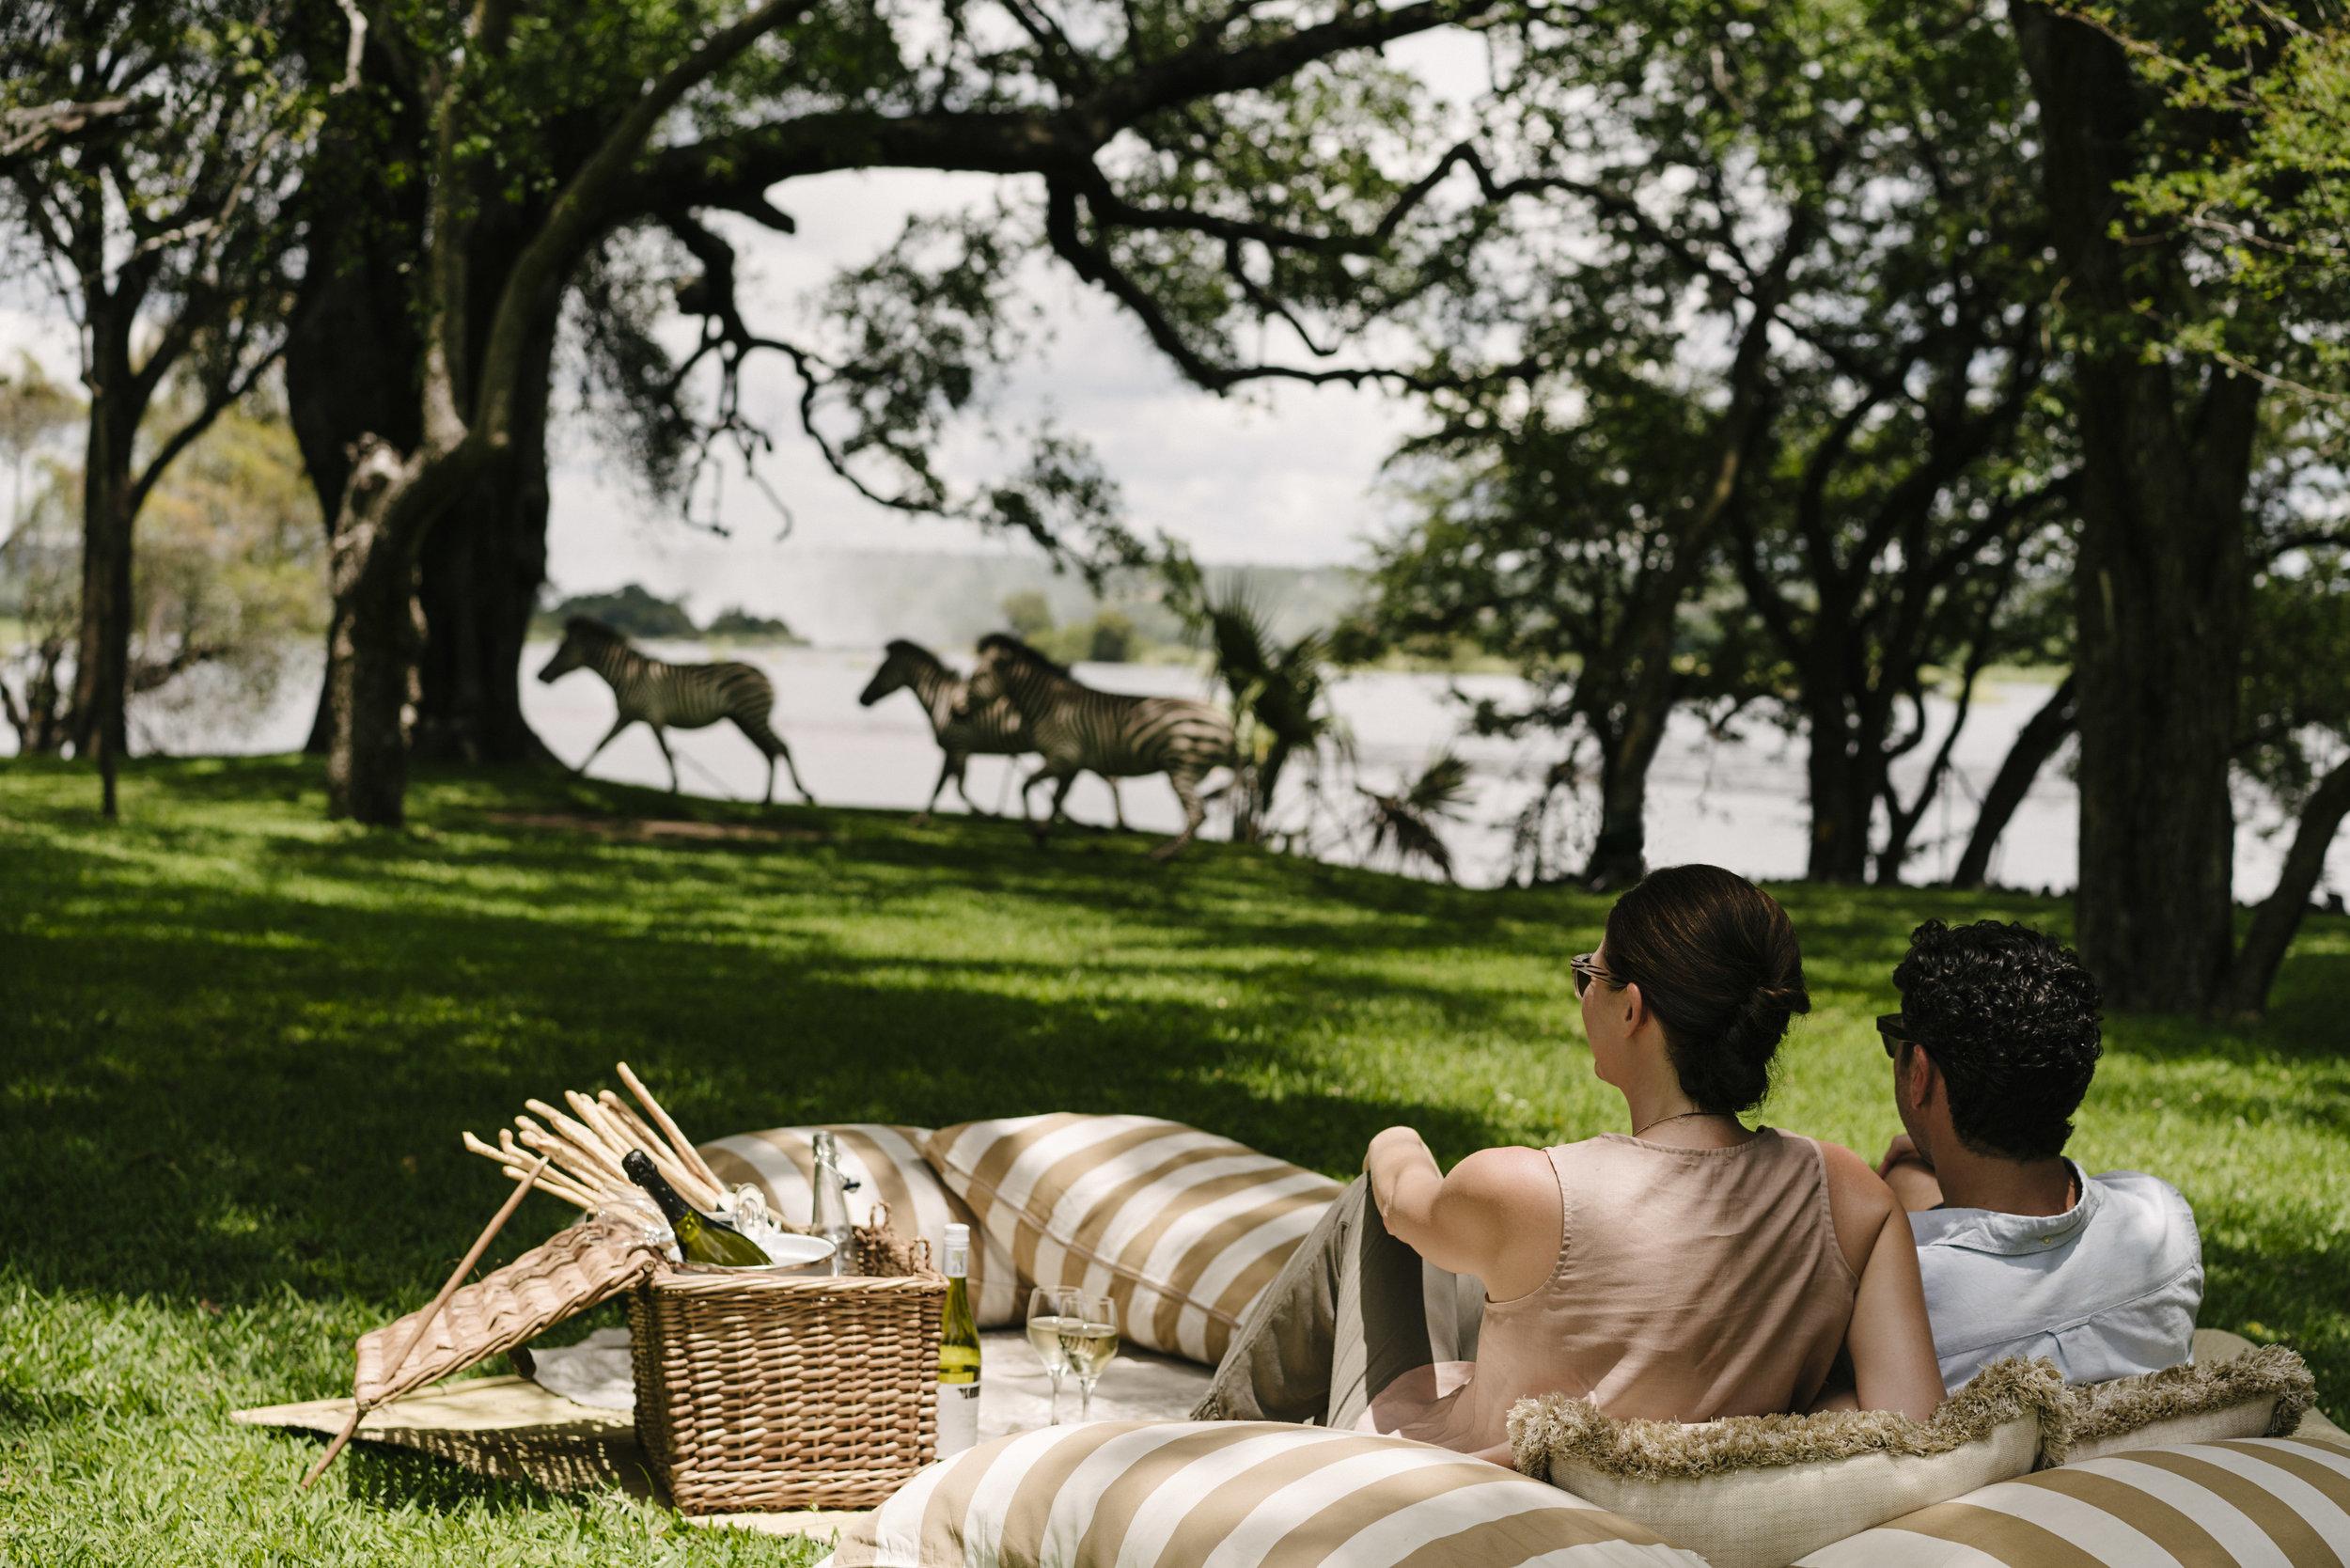 rl_dining_picnic_zebras_lifestyle_05_g_a_h1.jpg